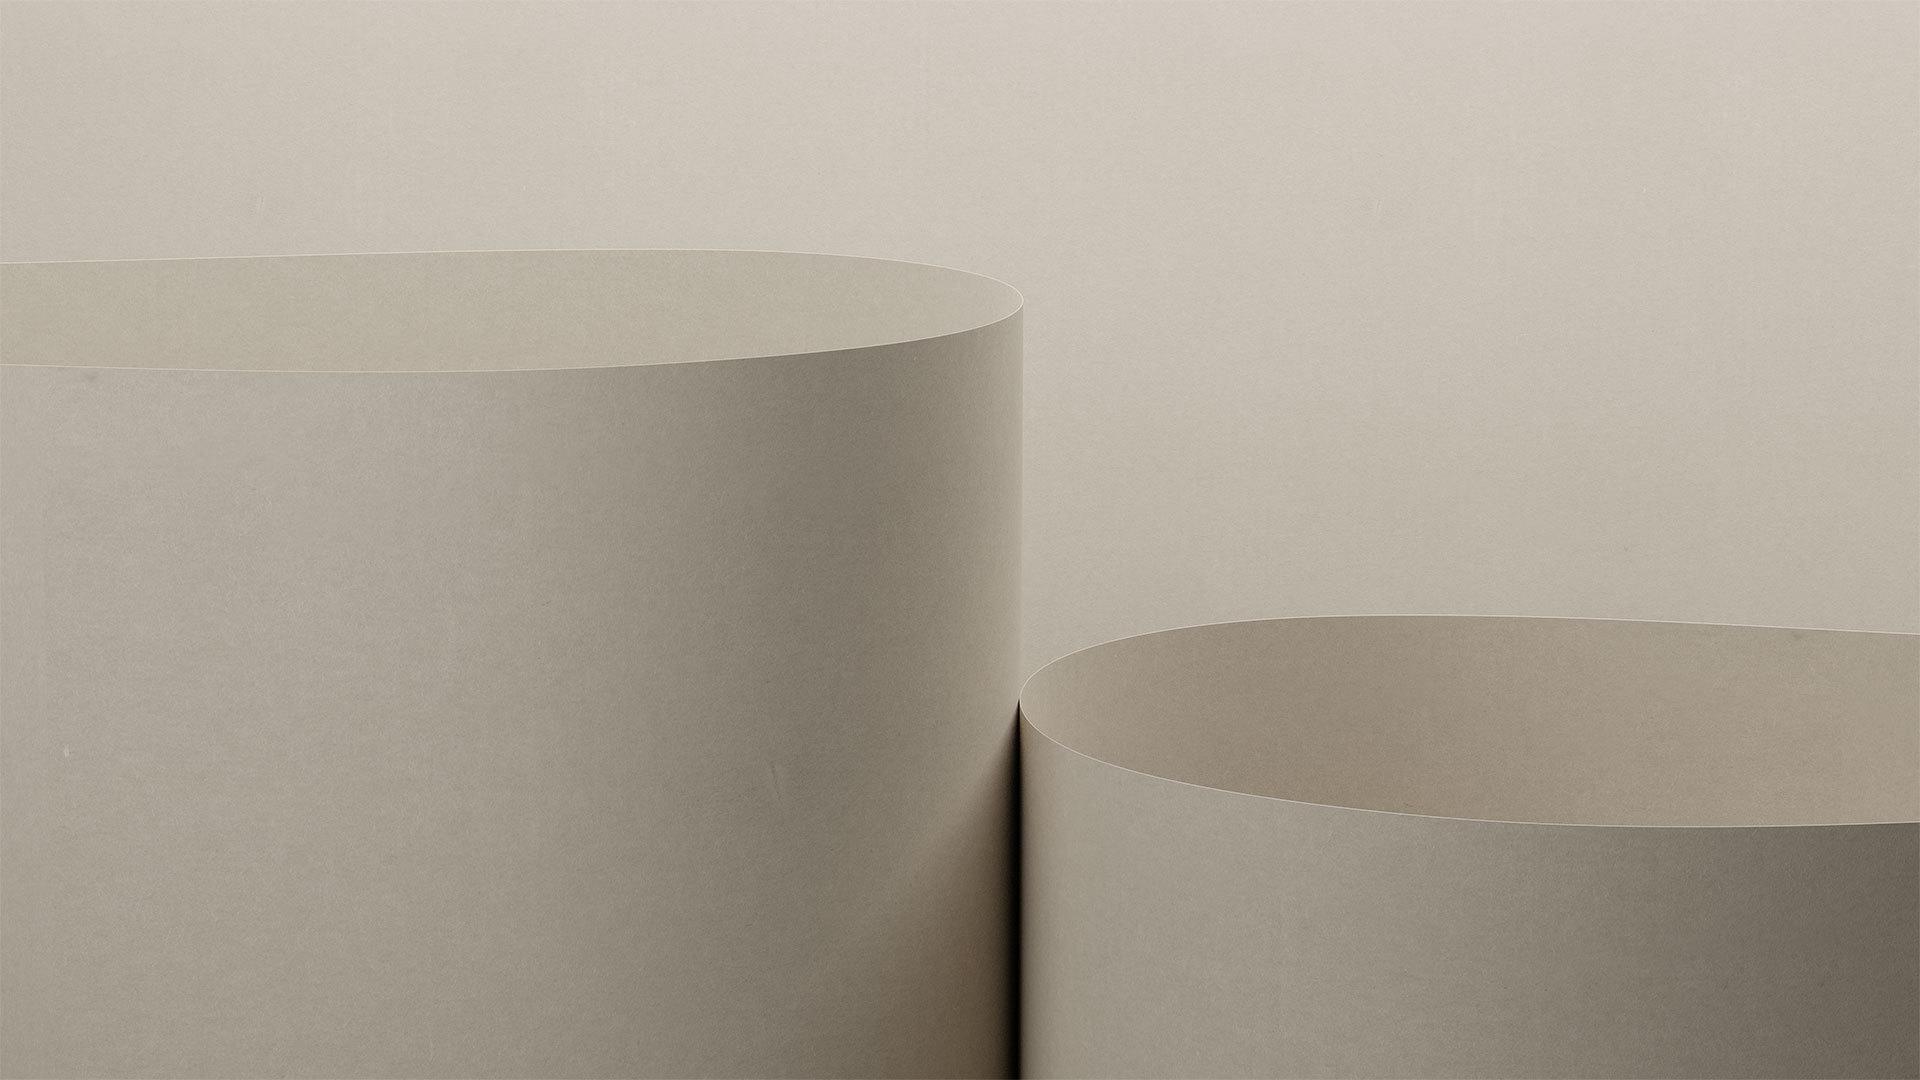 Landscape debrauw paper warm grey low res 2